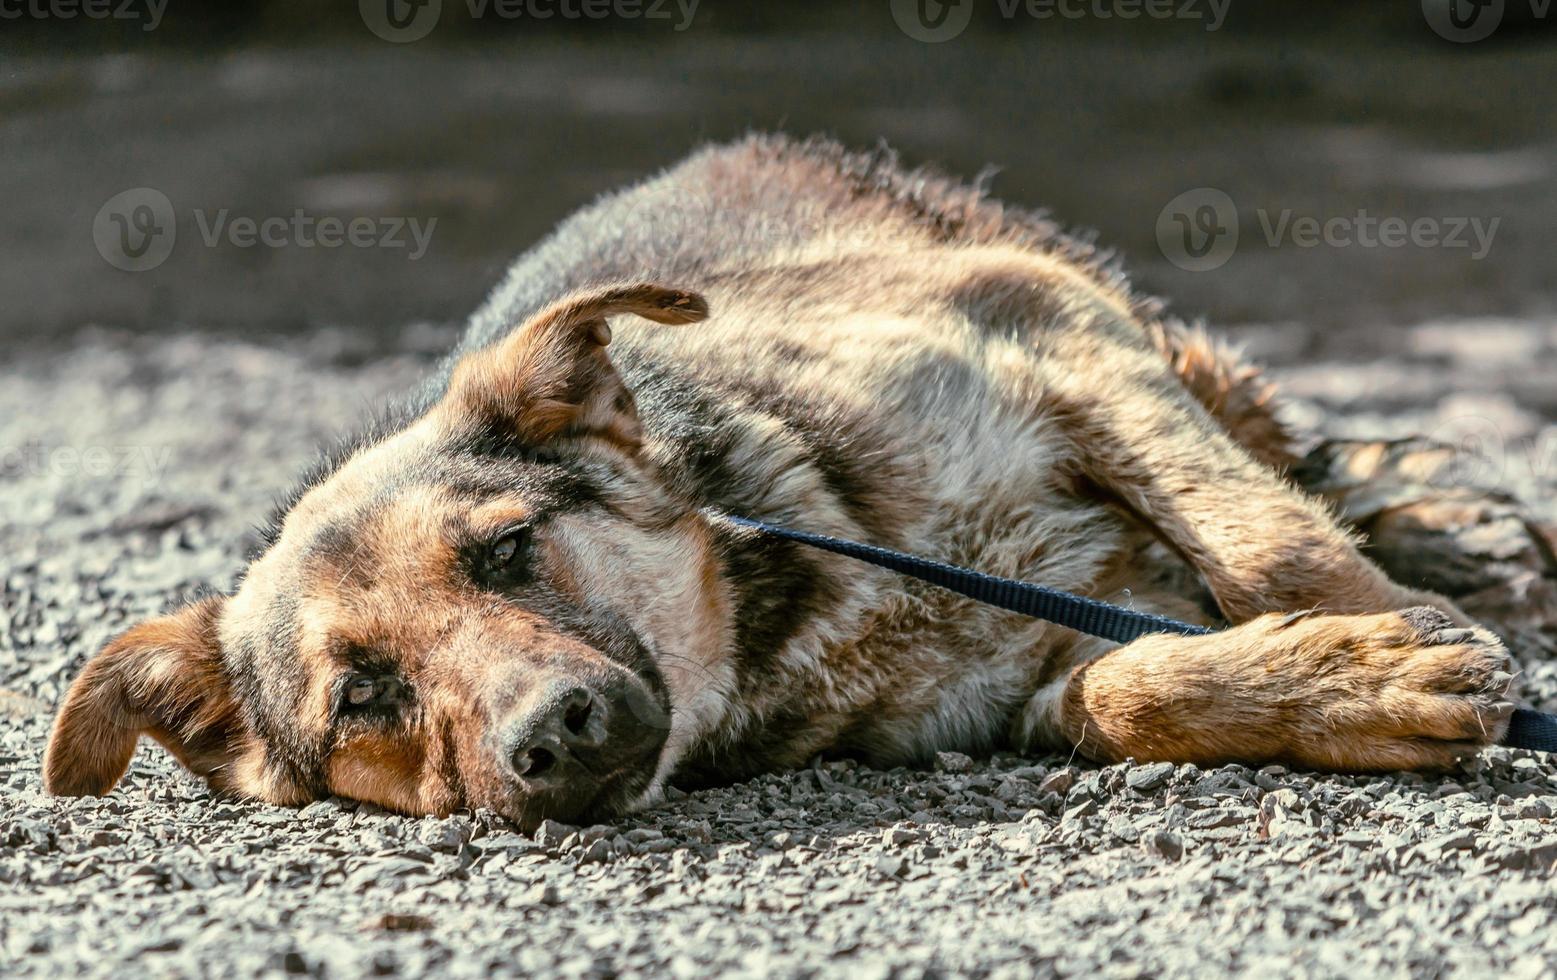 perro tendido sobre grava foto